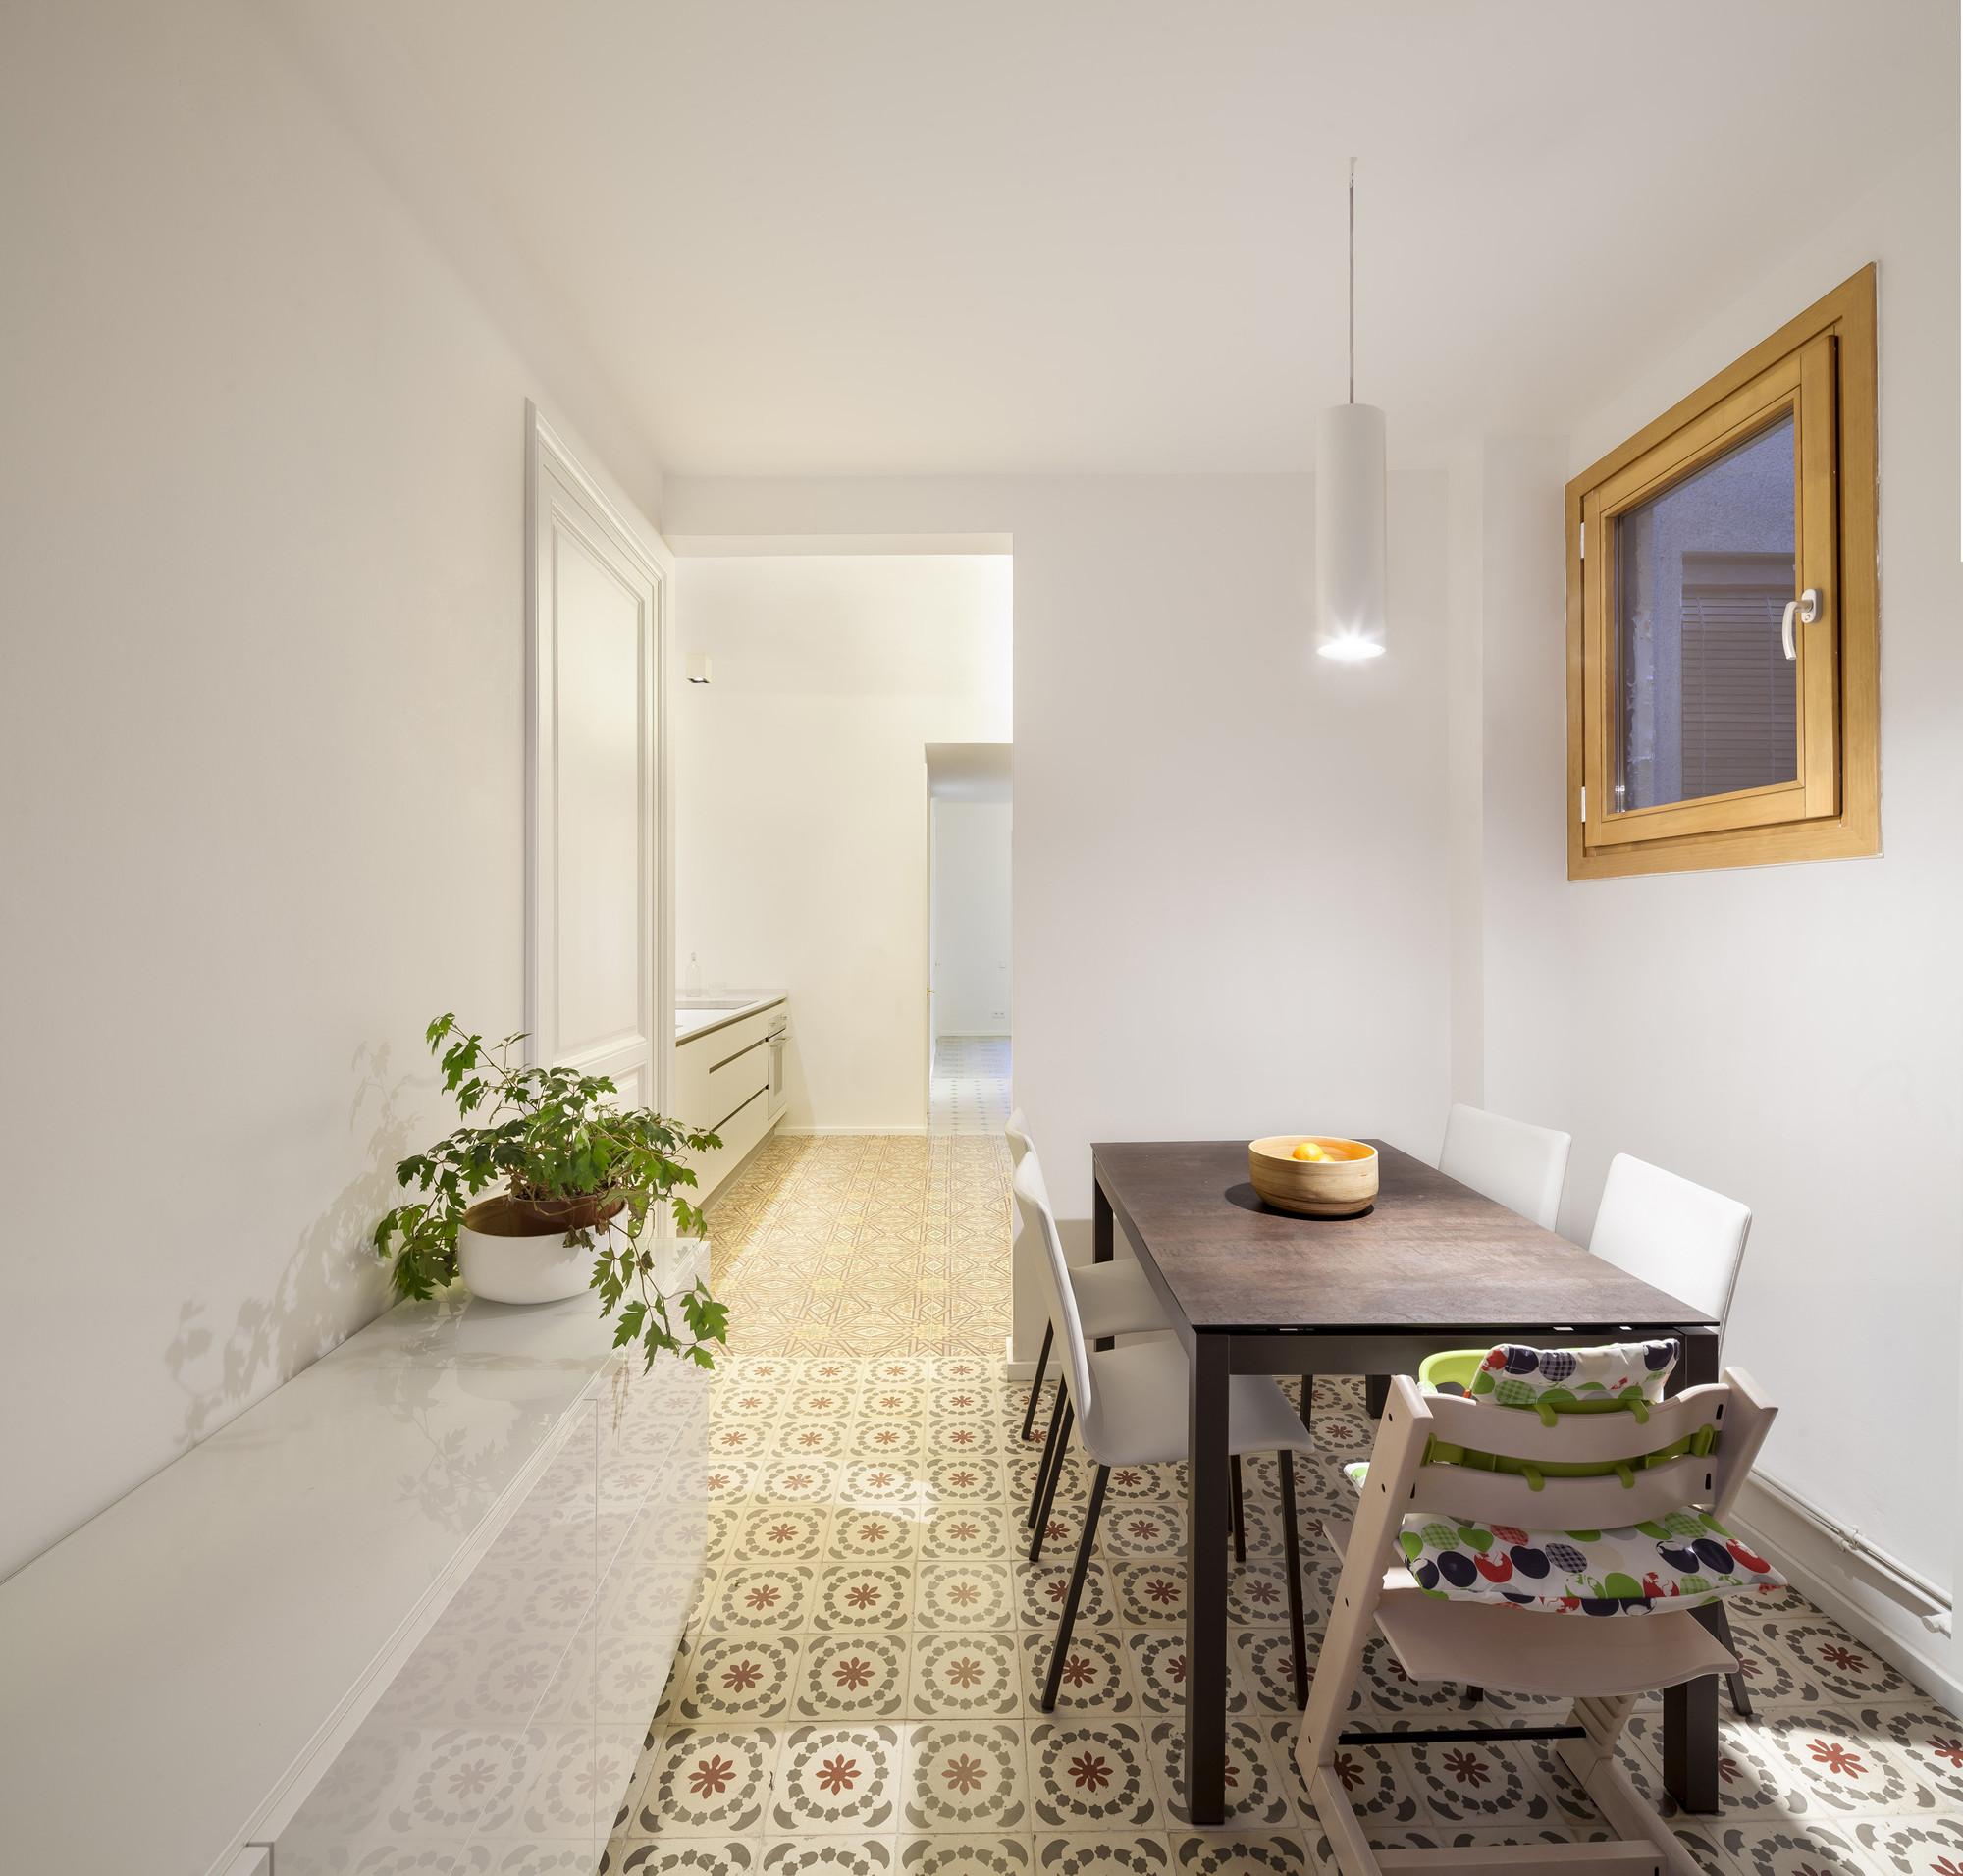 Reforma Apartamento en Barcelona  / Alventosa Morell Arquitectes , © Adrià Goula